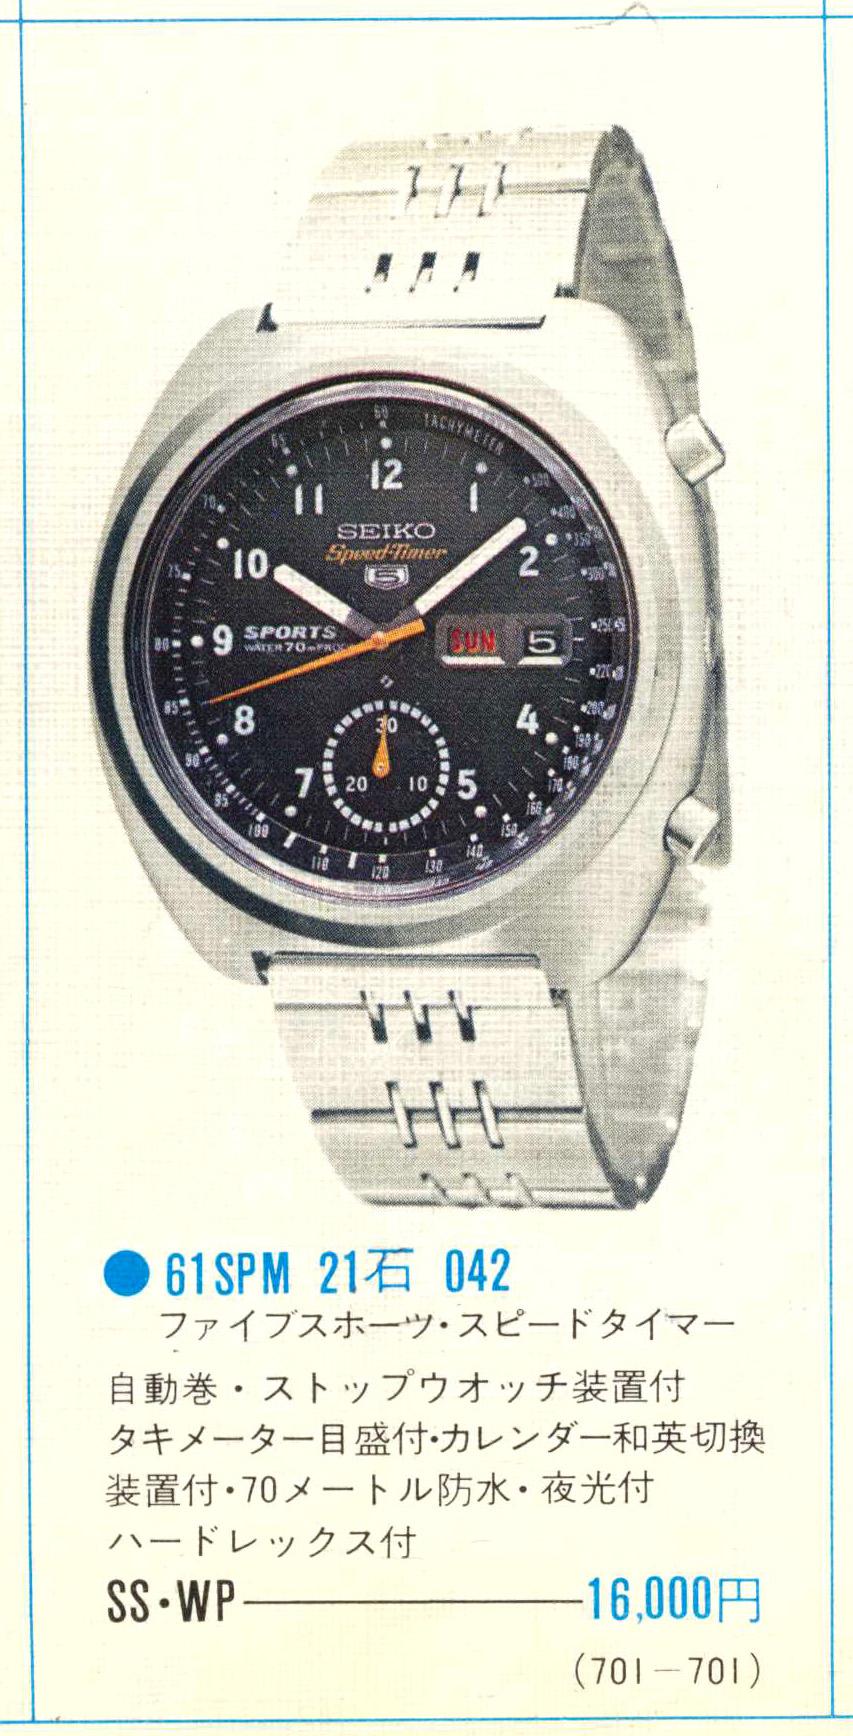 61SPM 042